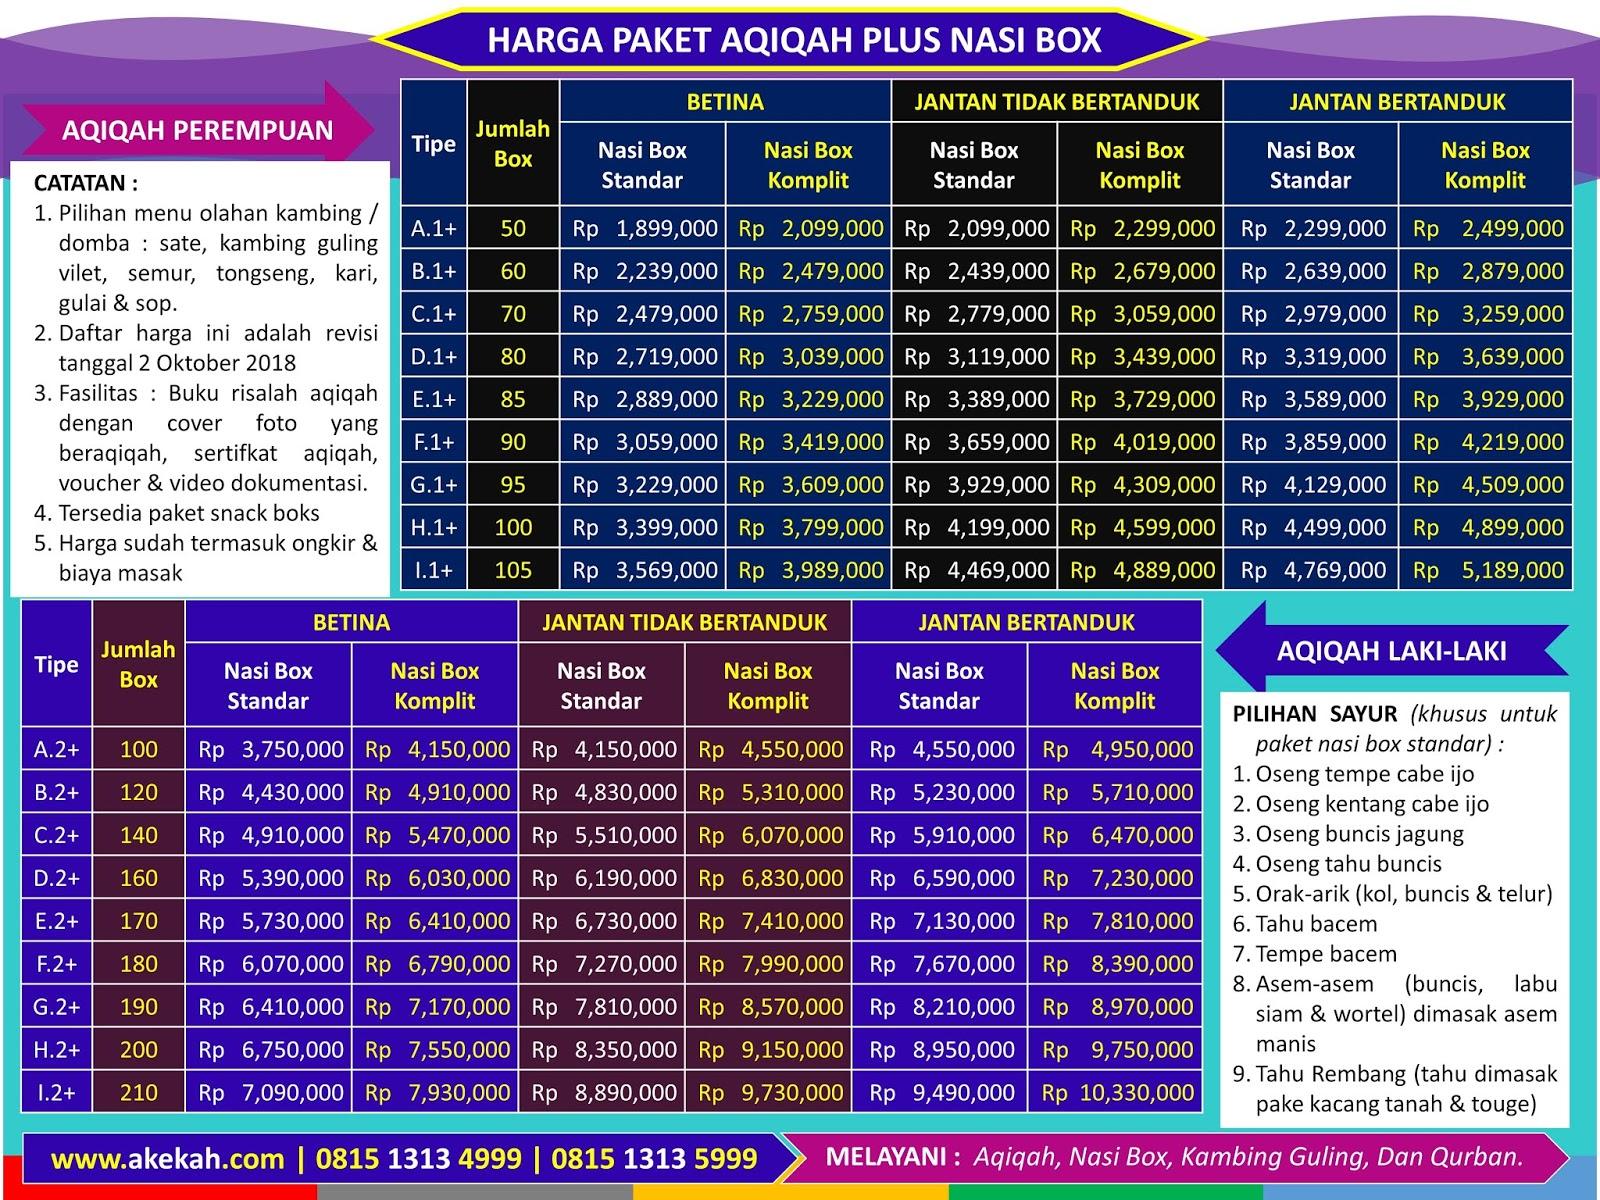 Harga Kambing Aqiqah & Catering Untuk Laki-Laki Daerah Bogor Jawa Barat